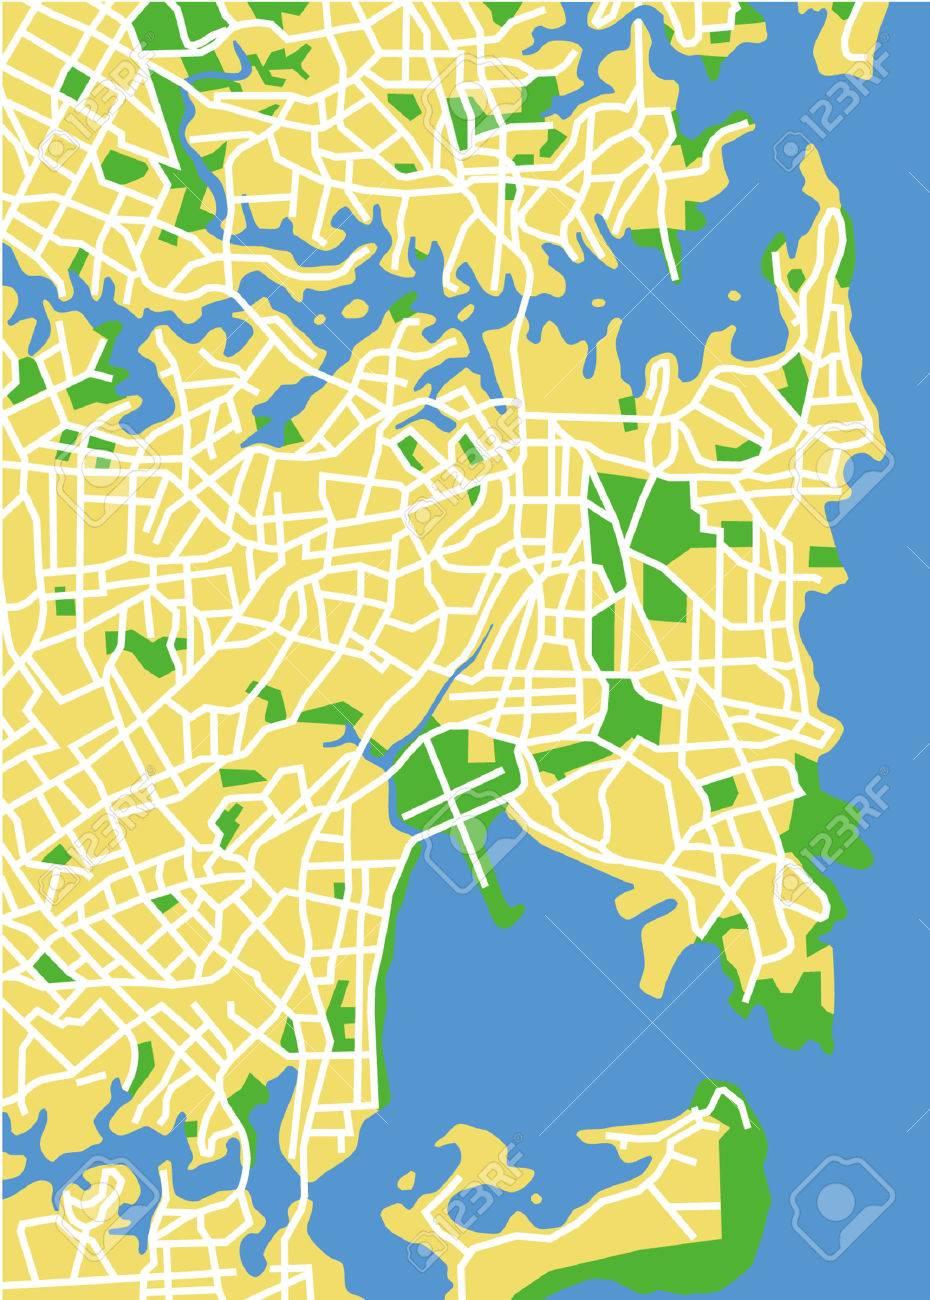 Sydney Australia Map City.Vector Pattern City Map Of Sydney Australia Royalty Free Cliparts